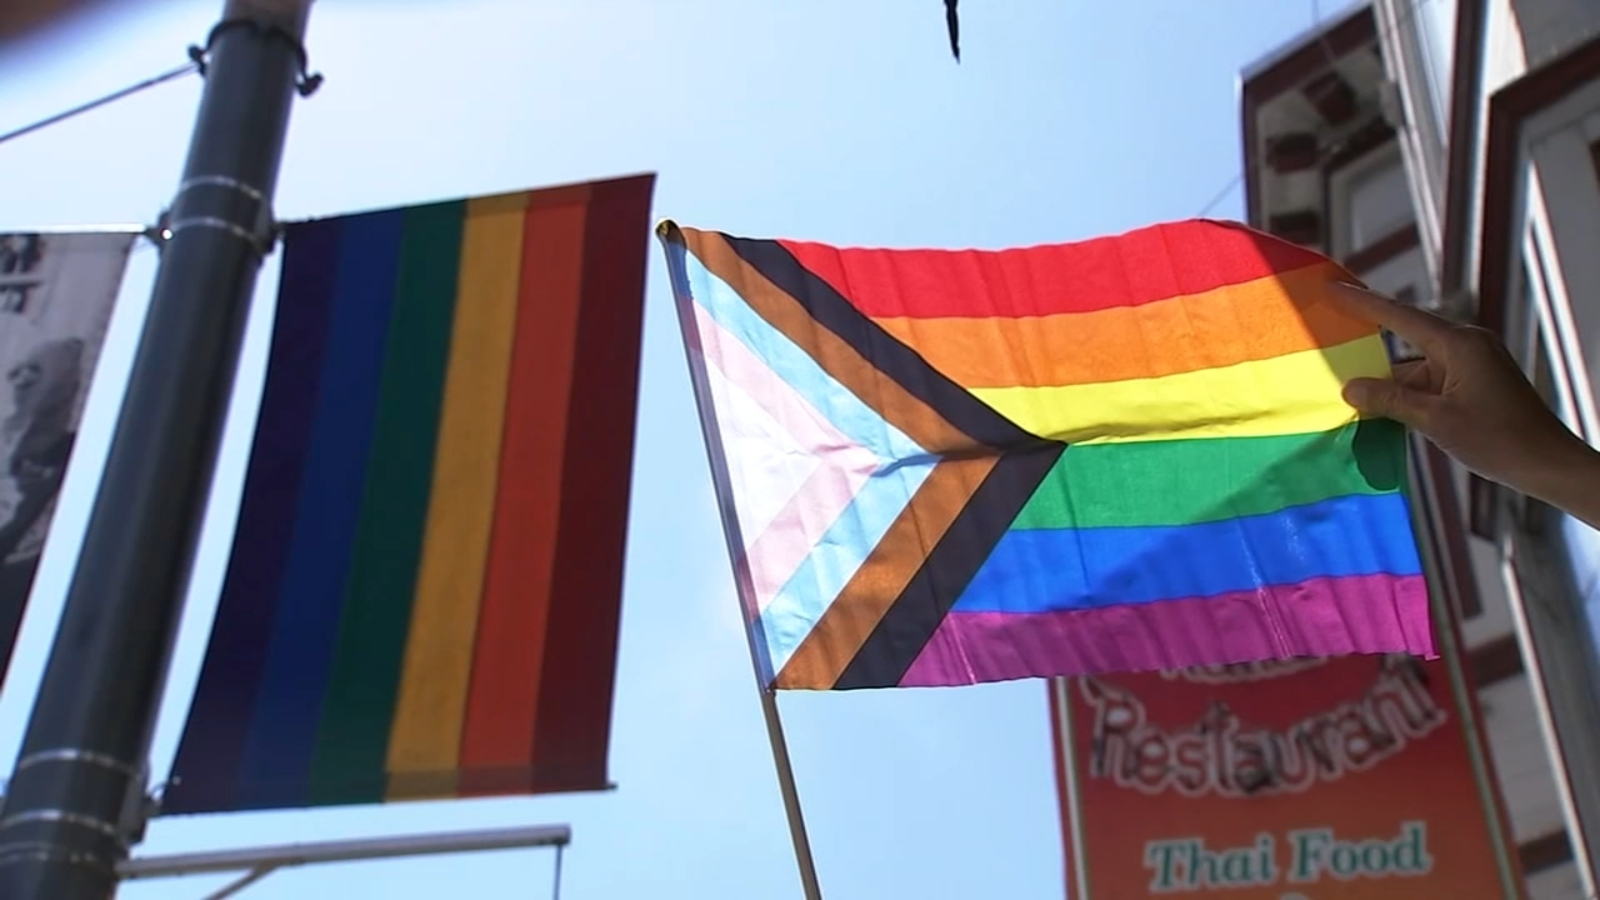 Lgtbq Community Split Over Revising Rainbow Flag To Progress Pride Flag Abc7 Chicago